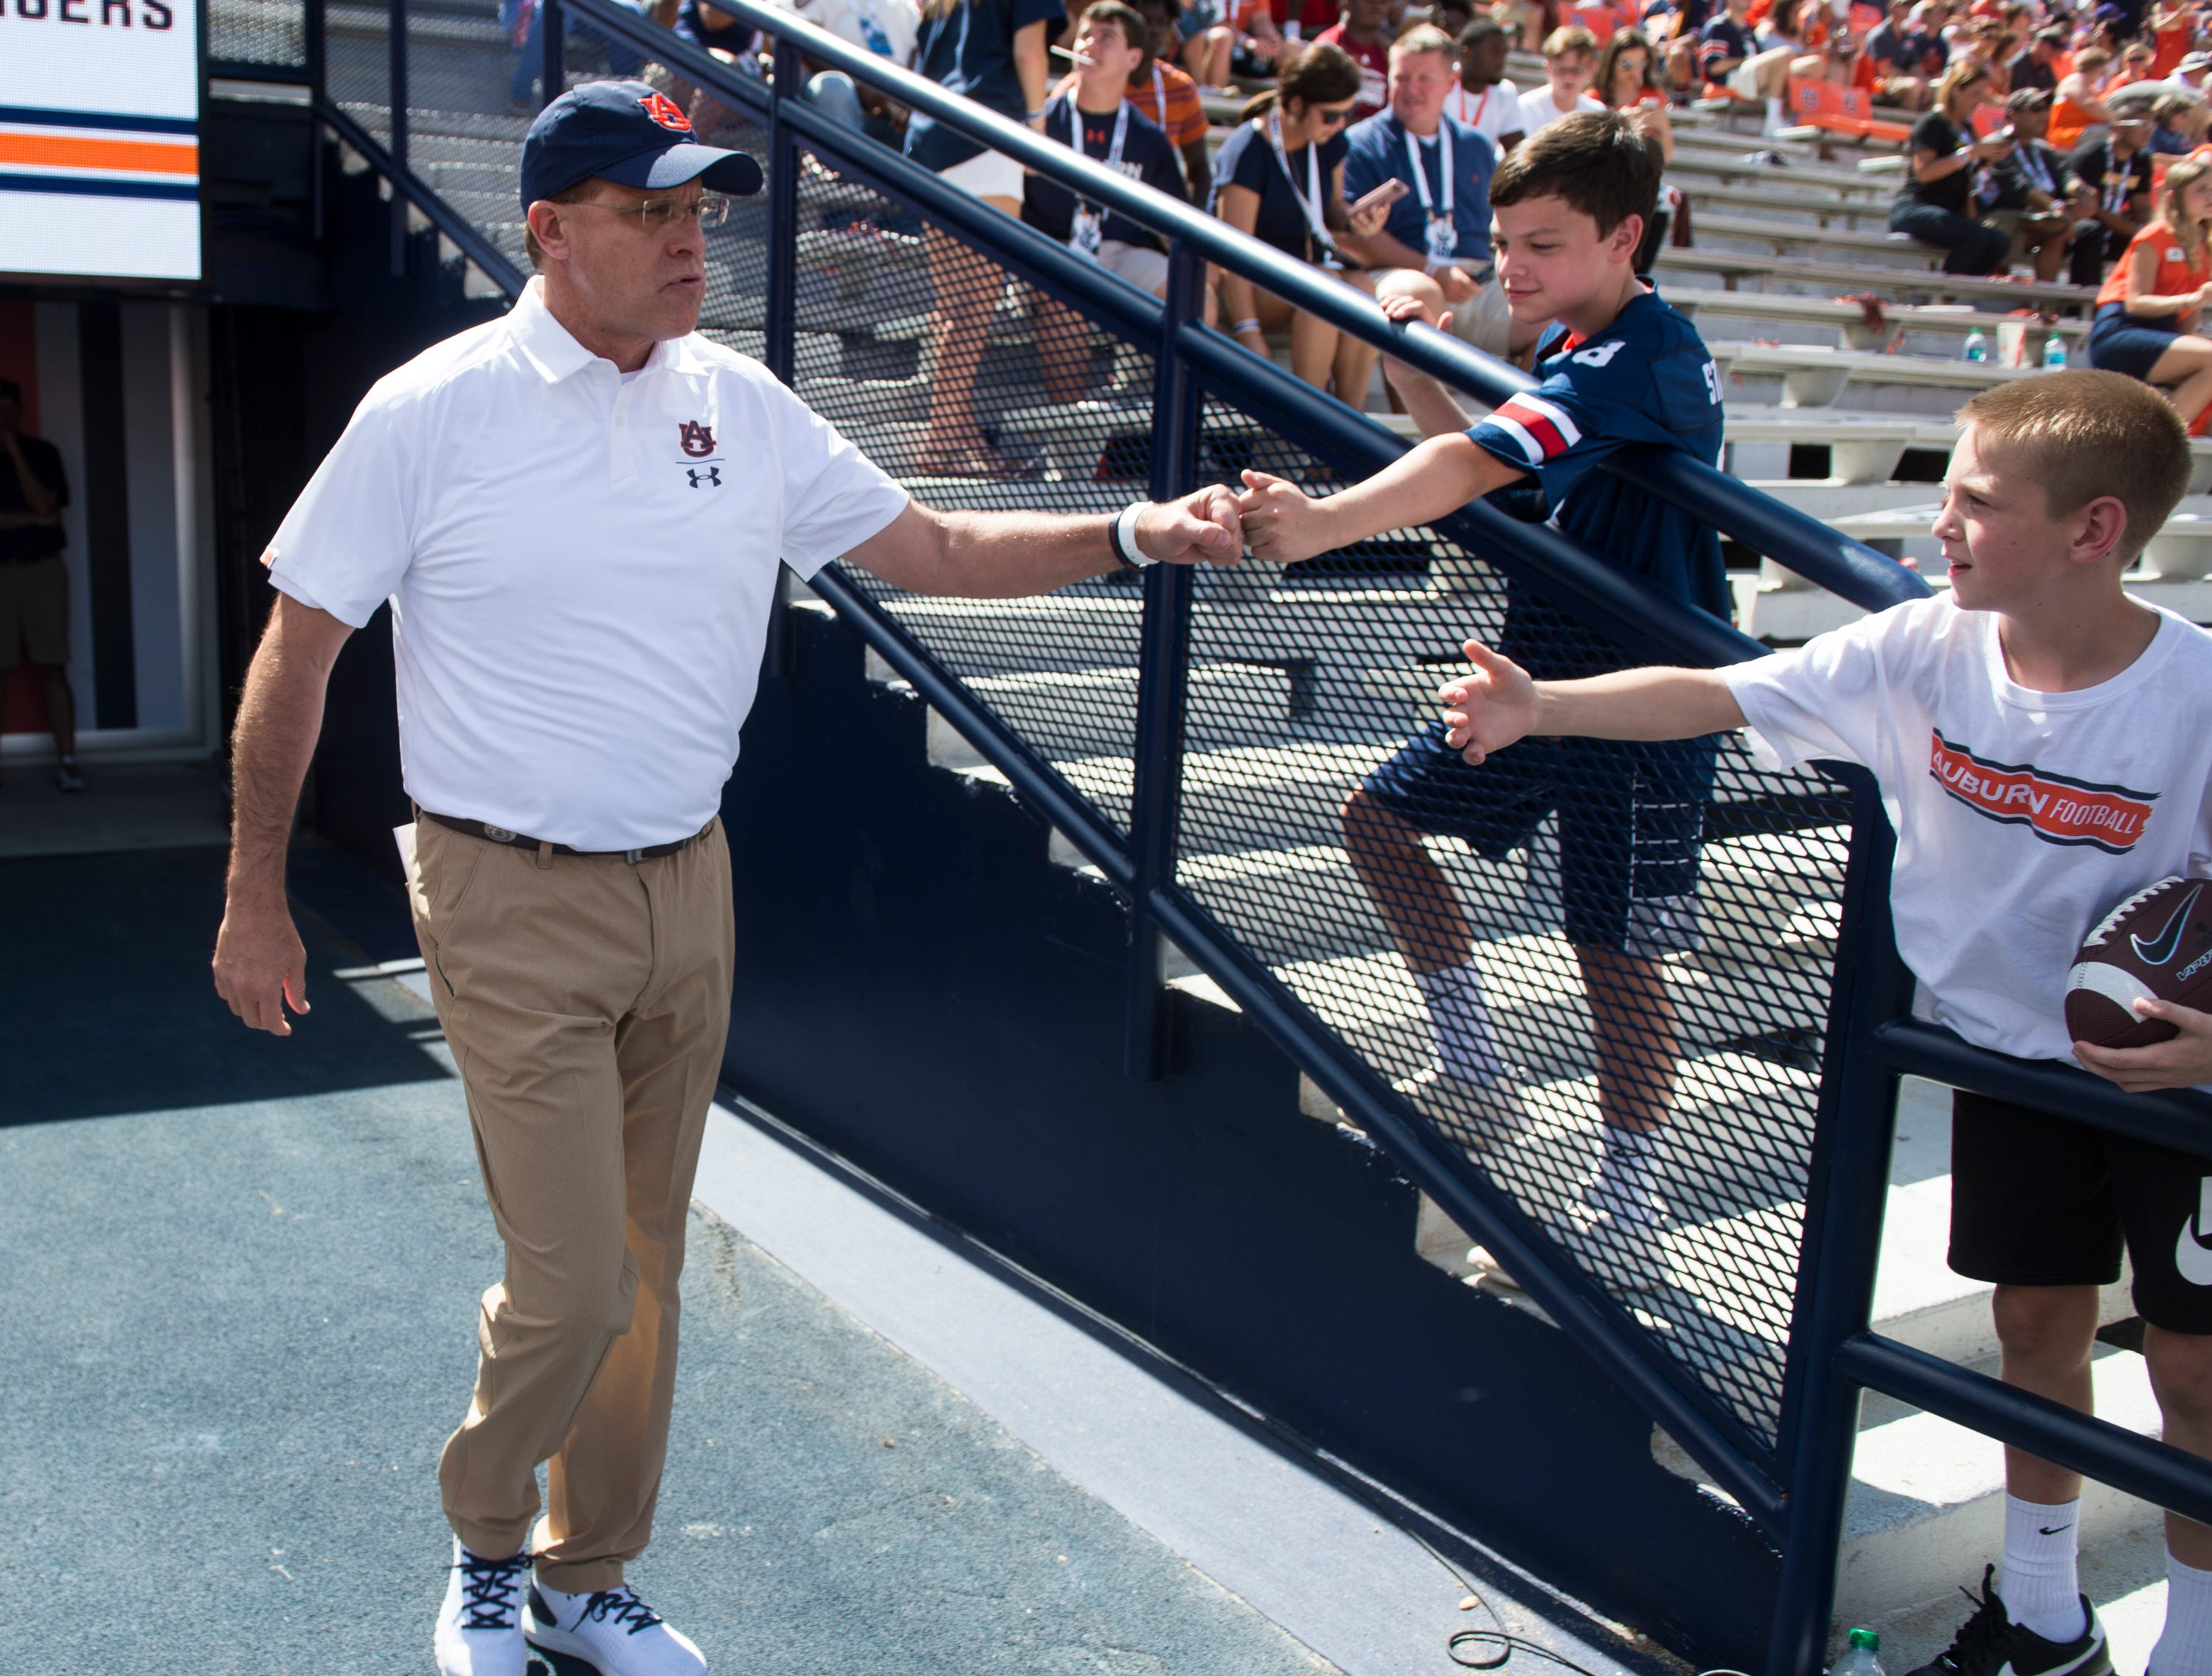 Auburn head coach Gus Malzahn walks on to the field for warm ups before Auburn takes on LSU at Jordan-Hare Stadium in Auburn, Ala., on Saturday, Sept. 15, 2018.